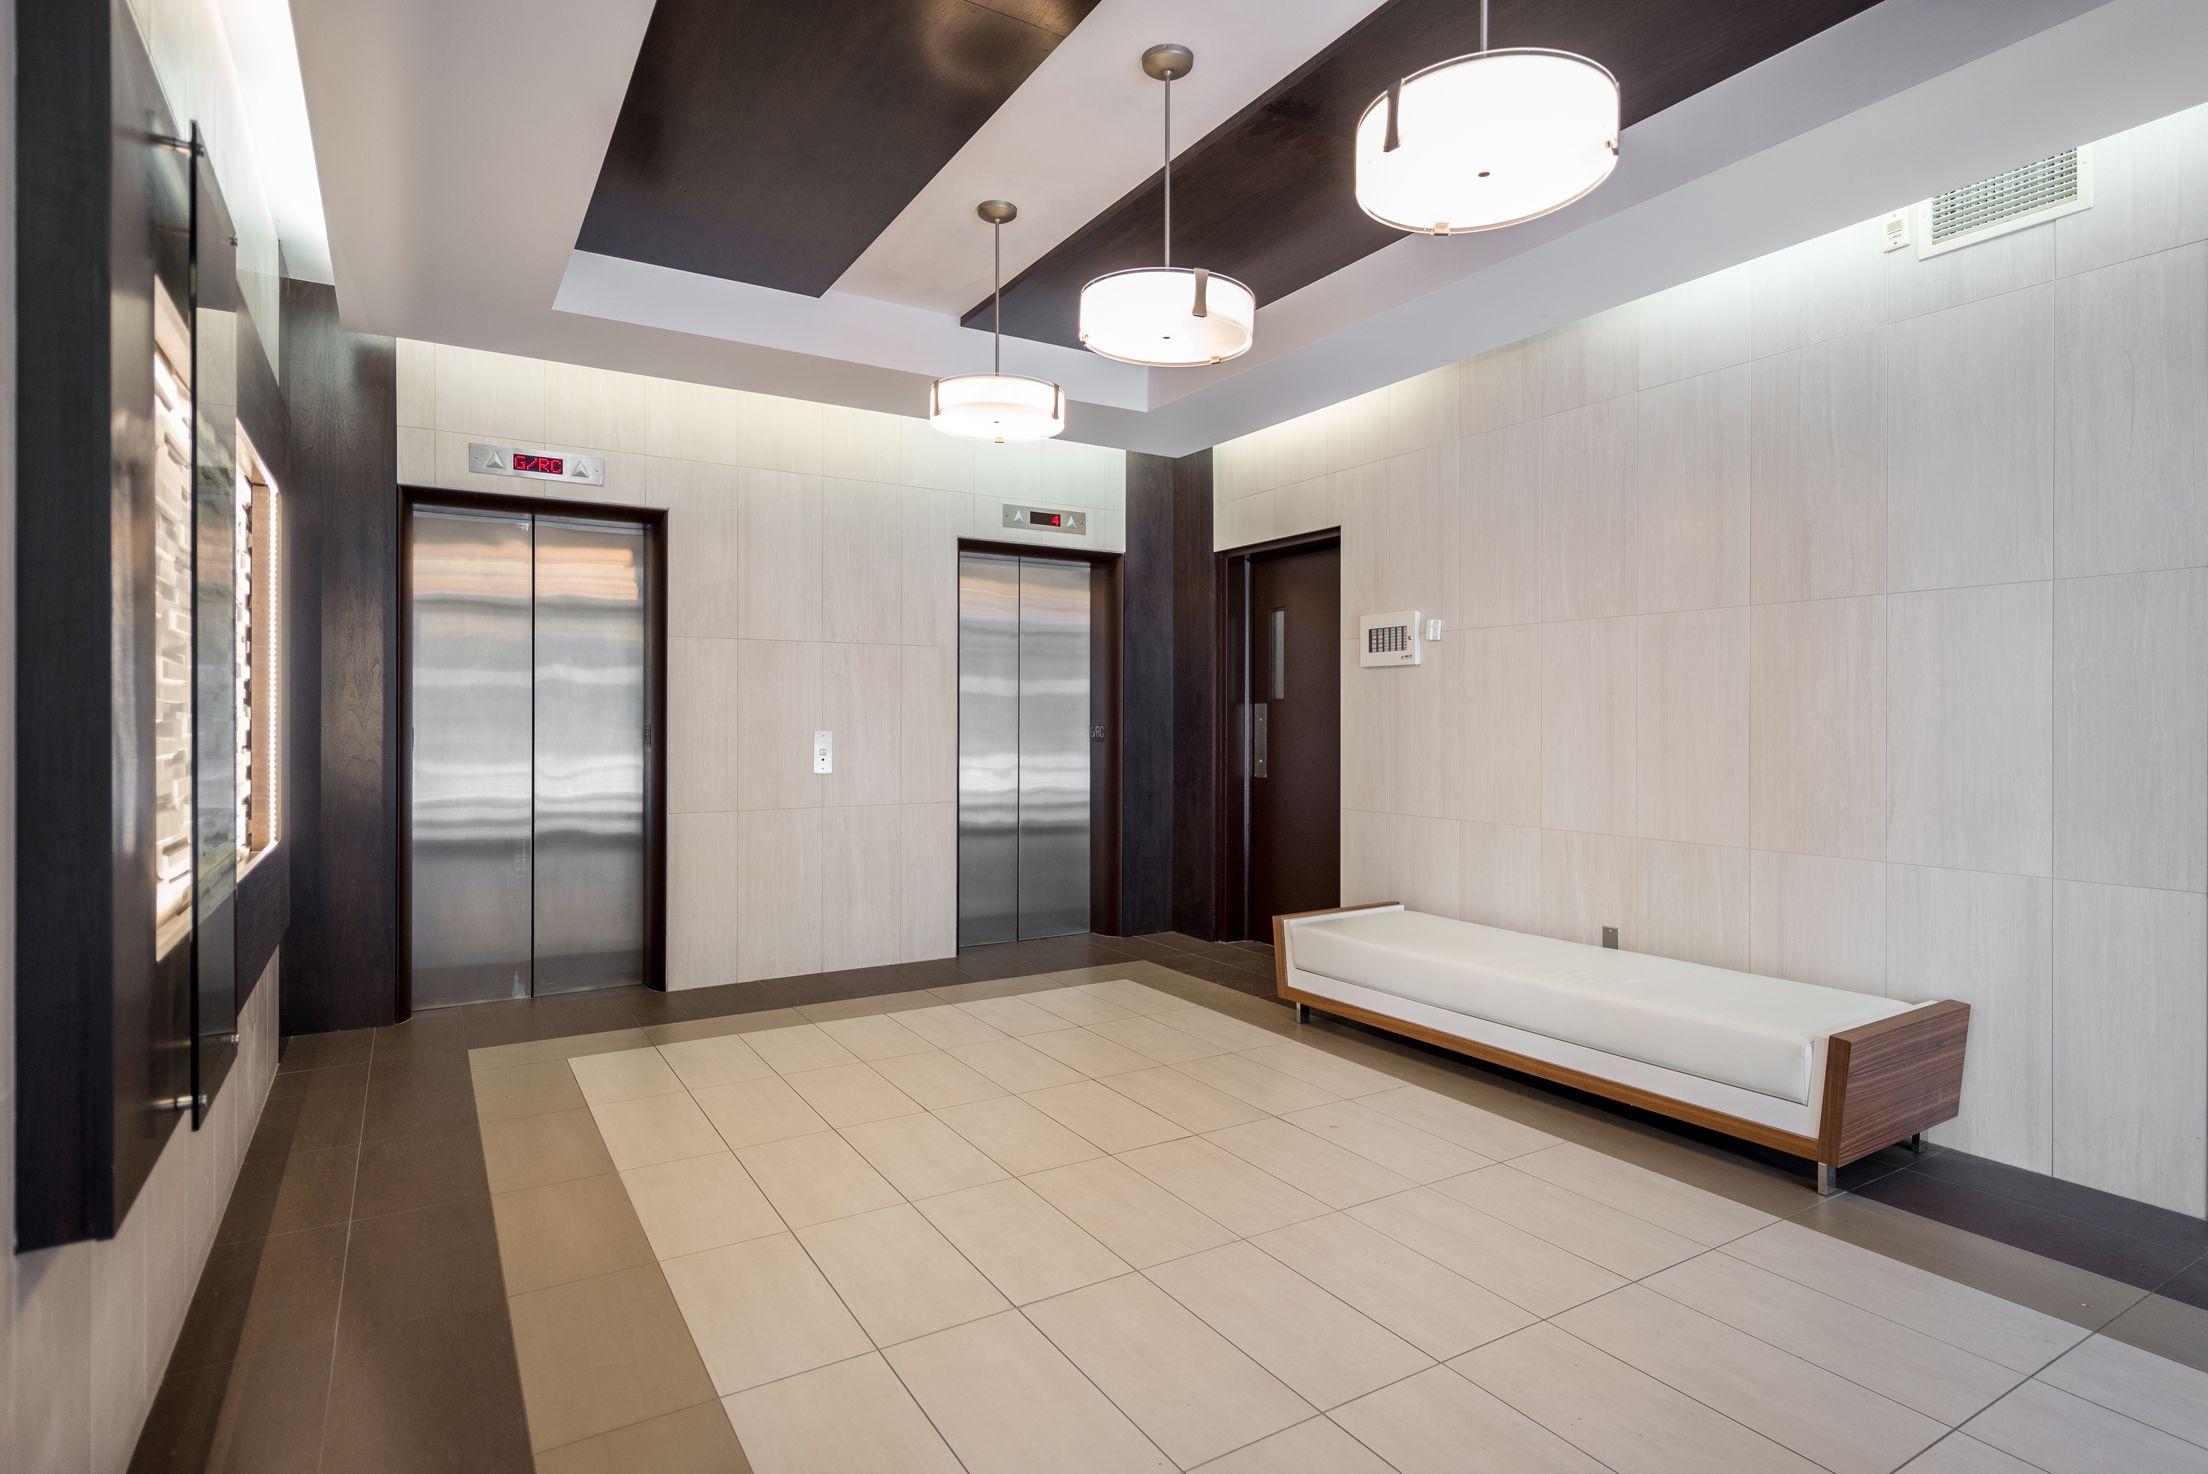 55 Metcalfe Street  Elevator Area - Lift Hotel -